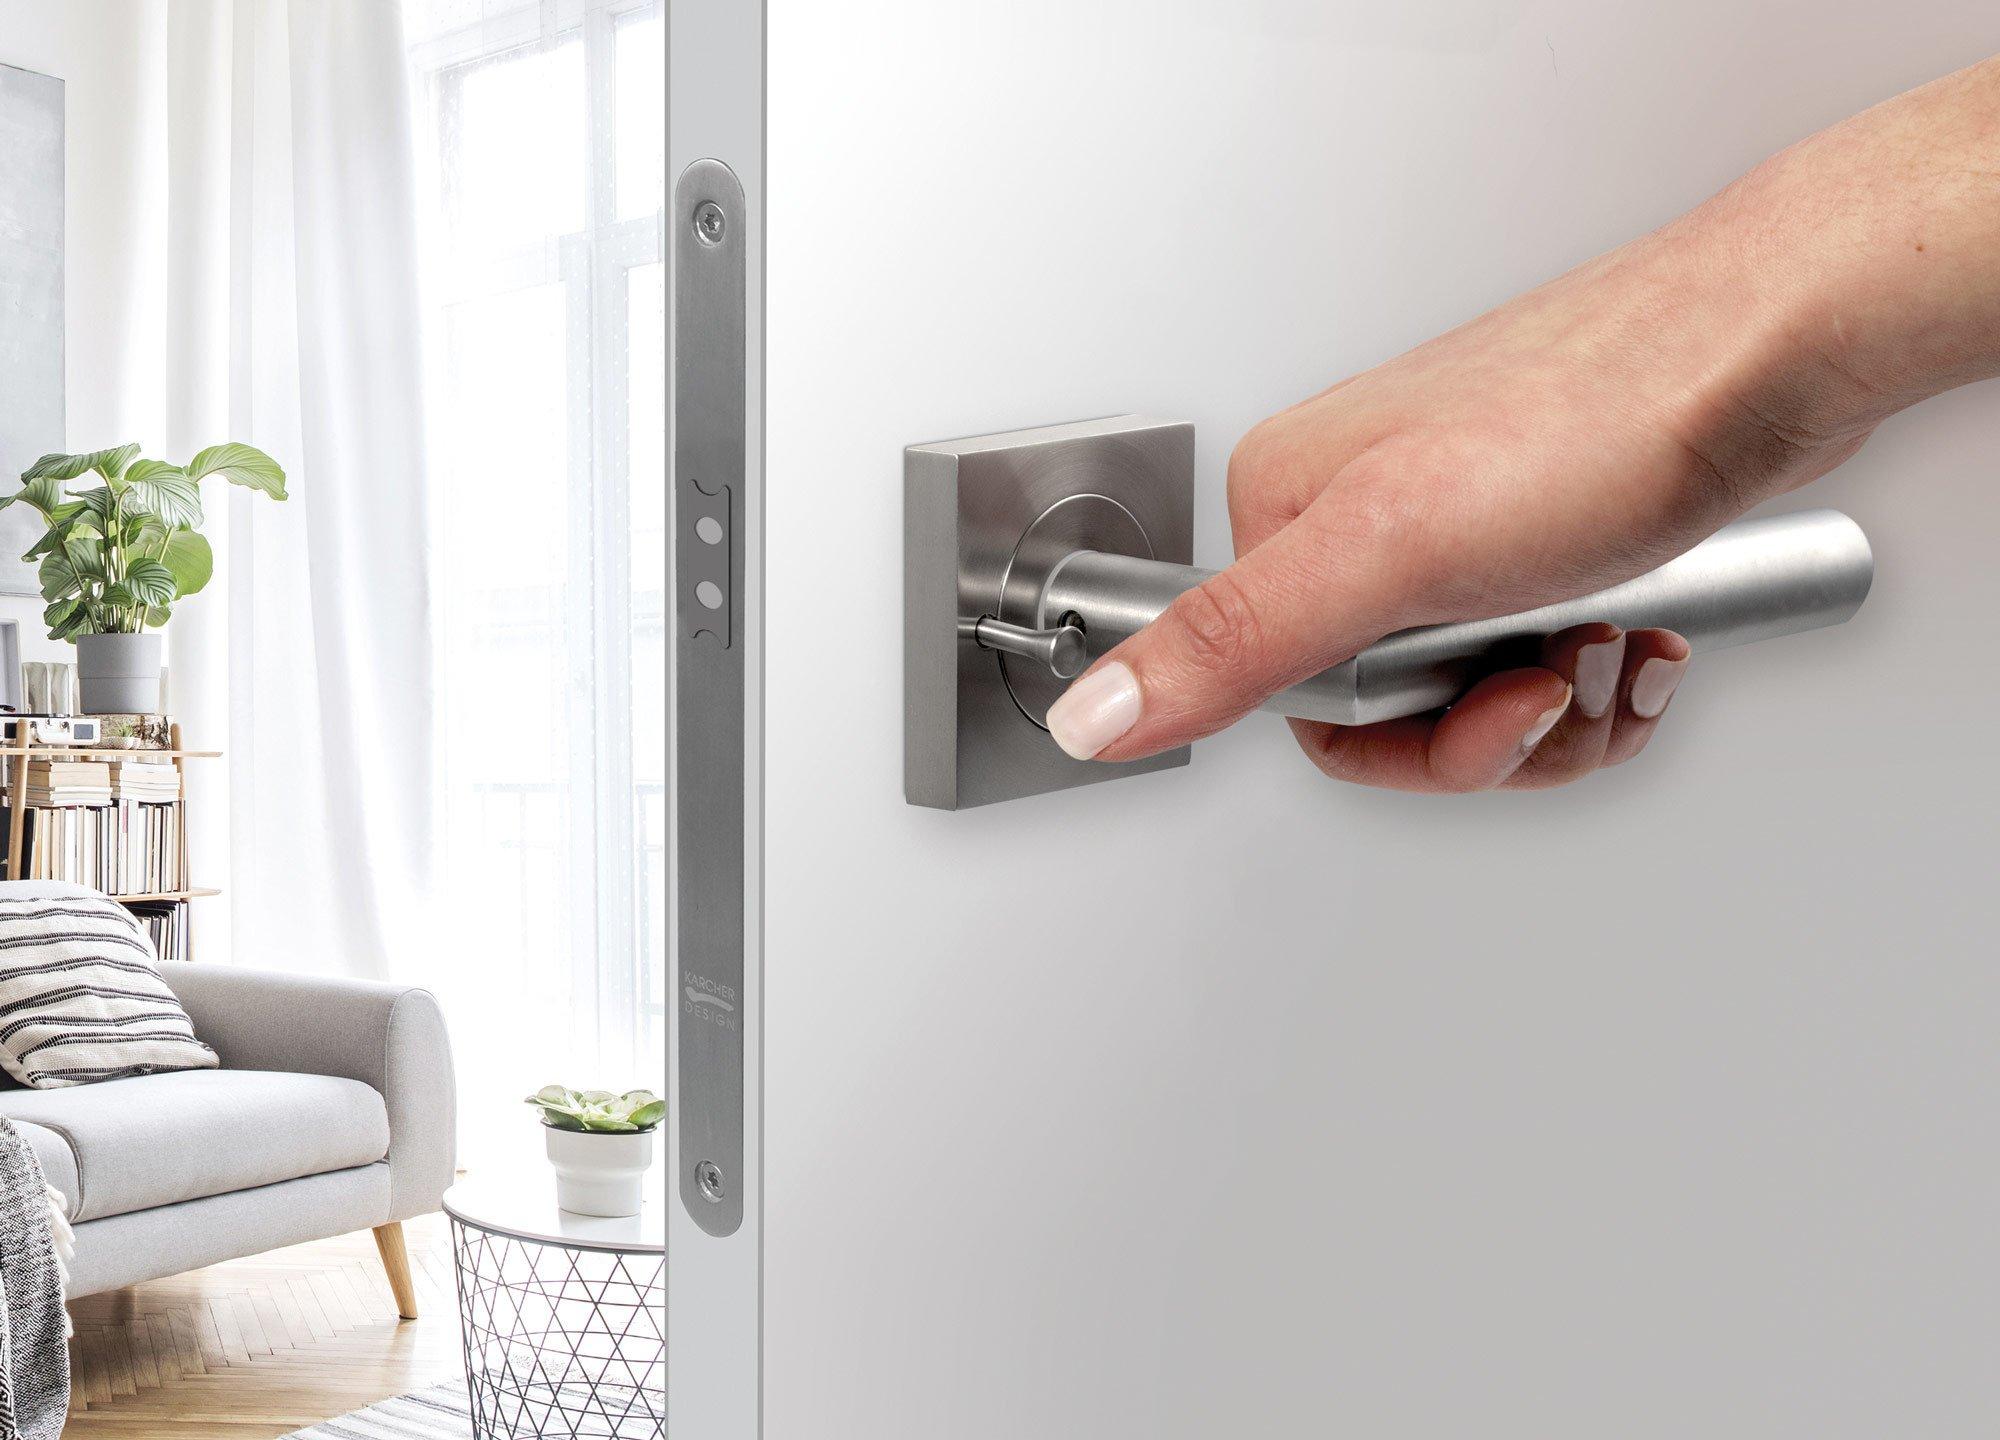 Rhodos ER28 in Edelstahl matt mit intergrierter Privacy-Pin-Technologie KD Comfort